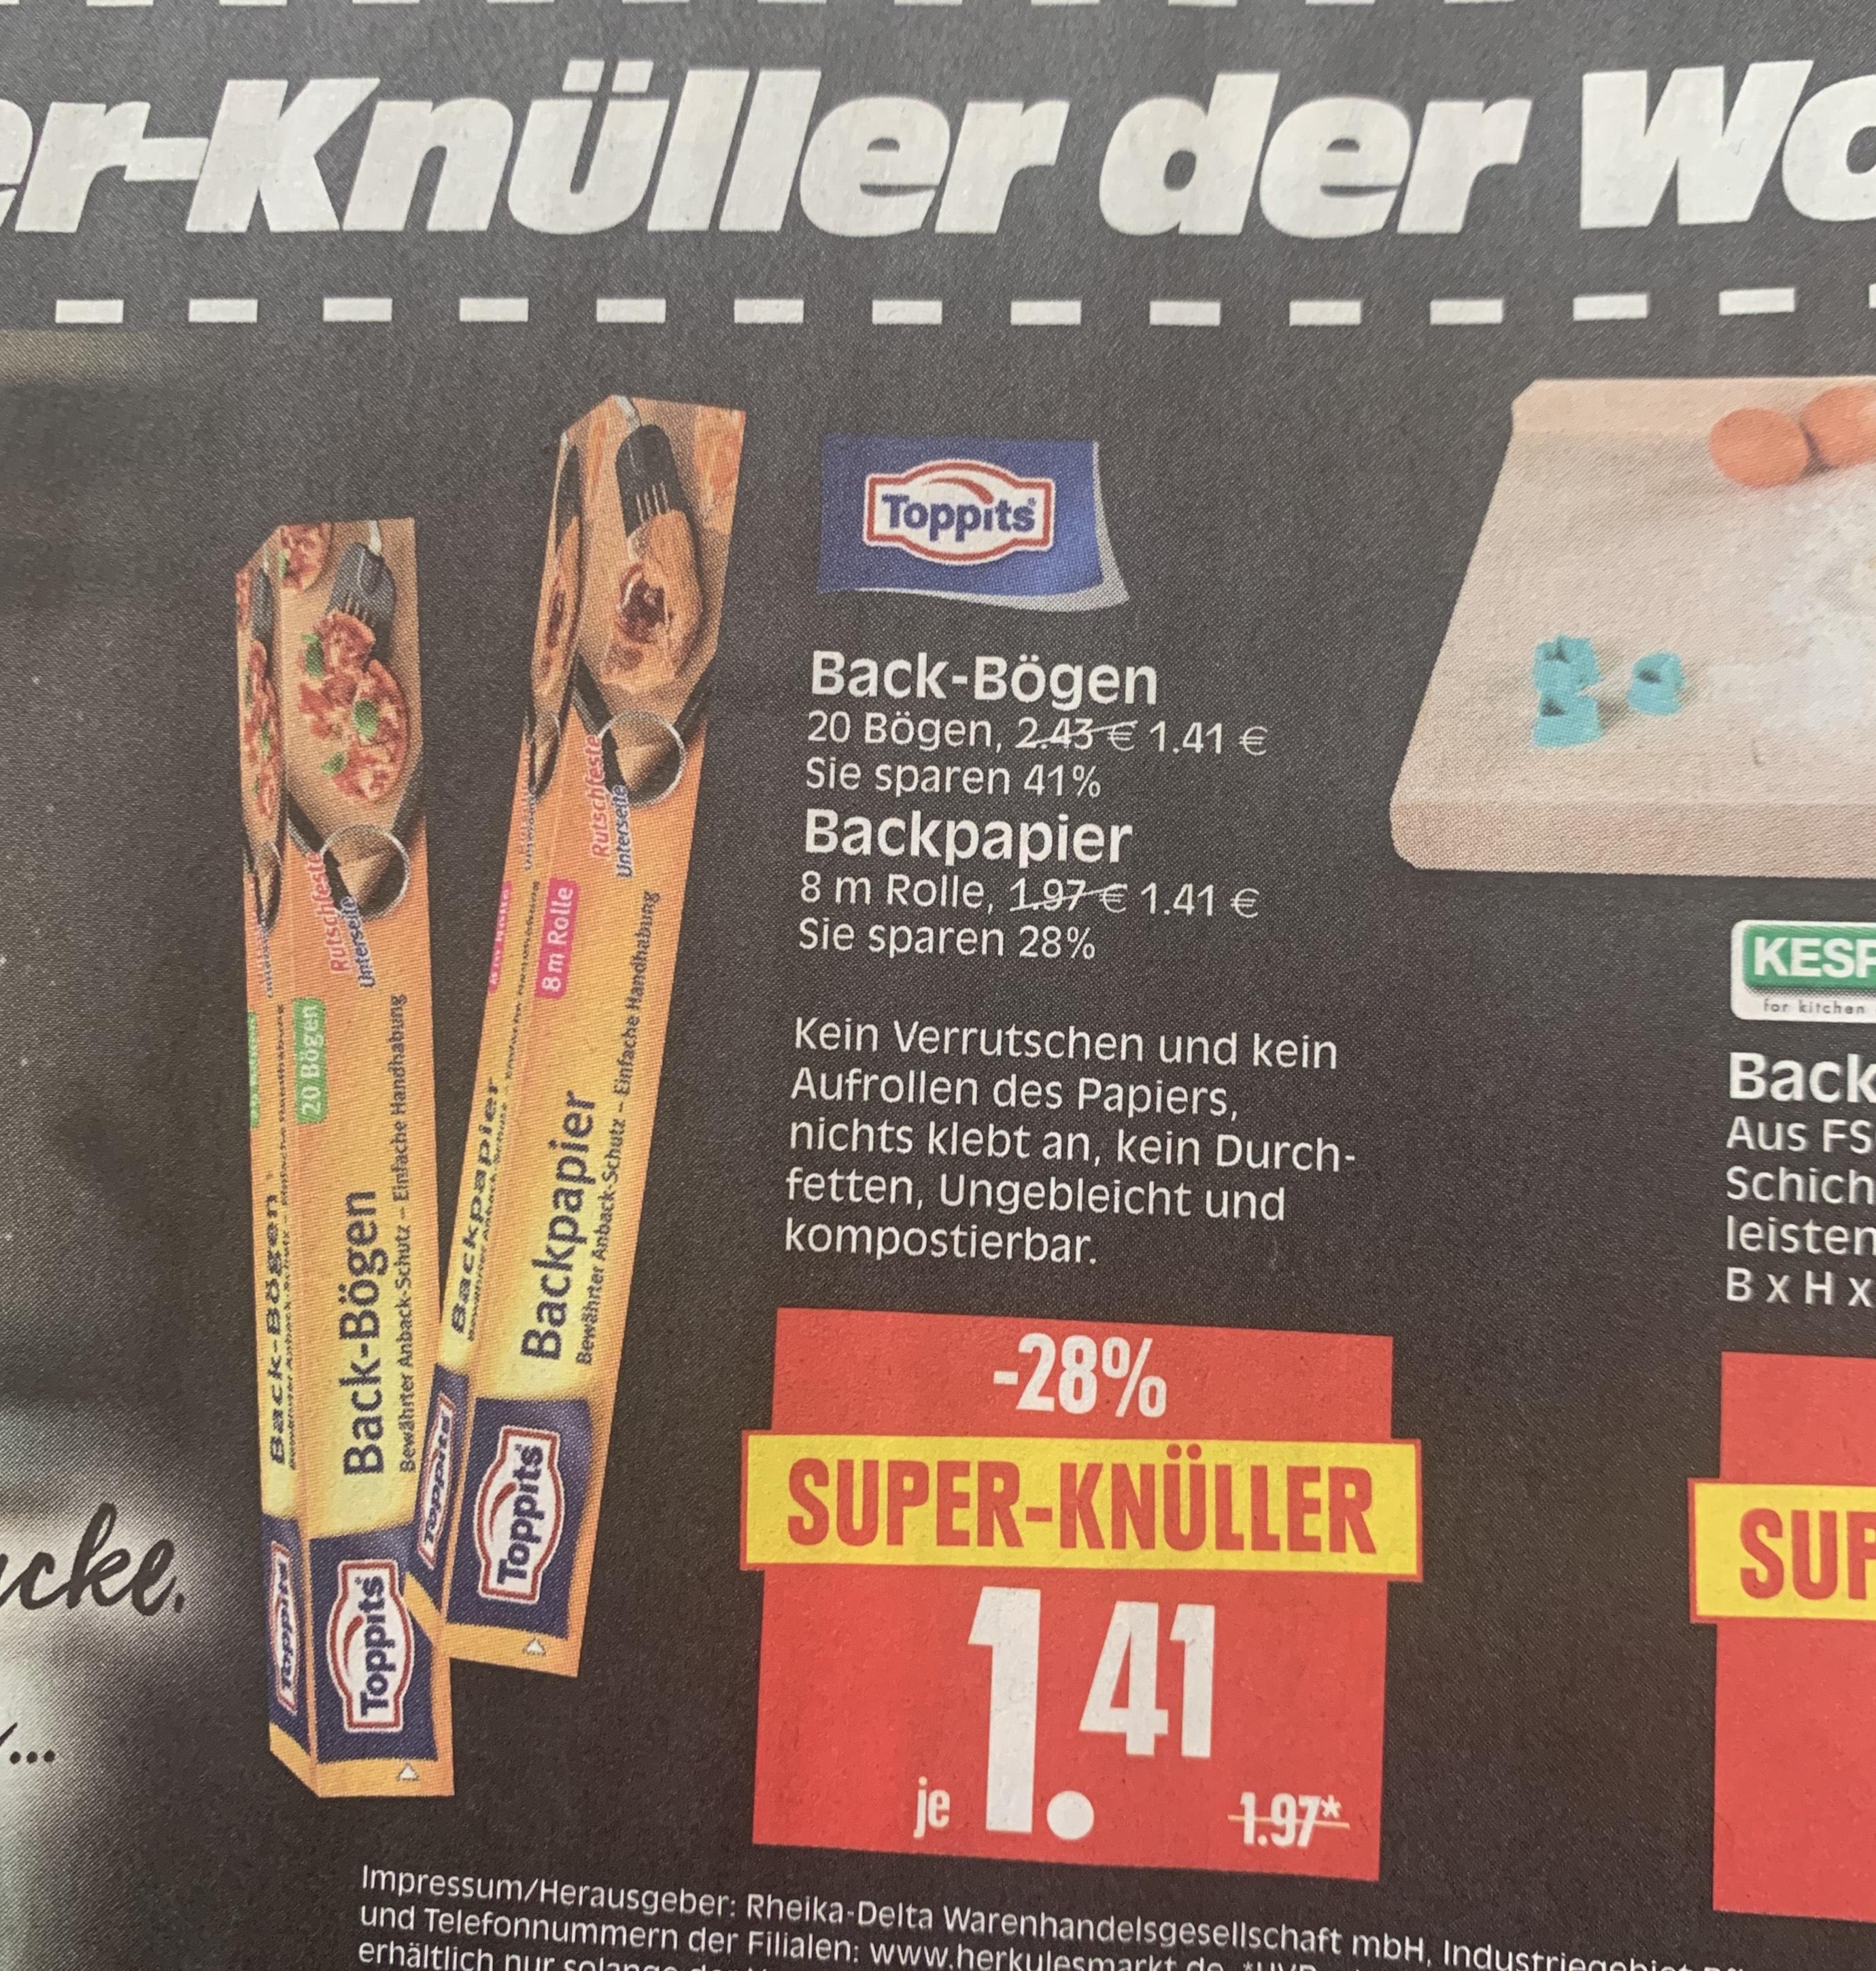 [Herkules] Regional - Supermarkt Toppits Backpapier - Scondoo 1 € - kochbarcashback